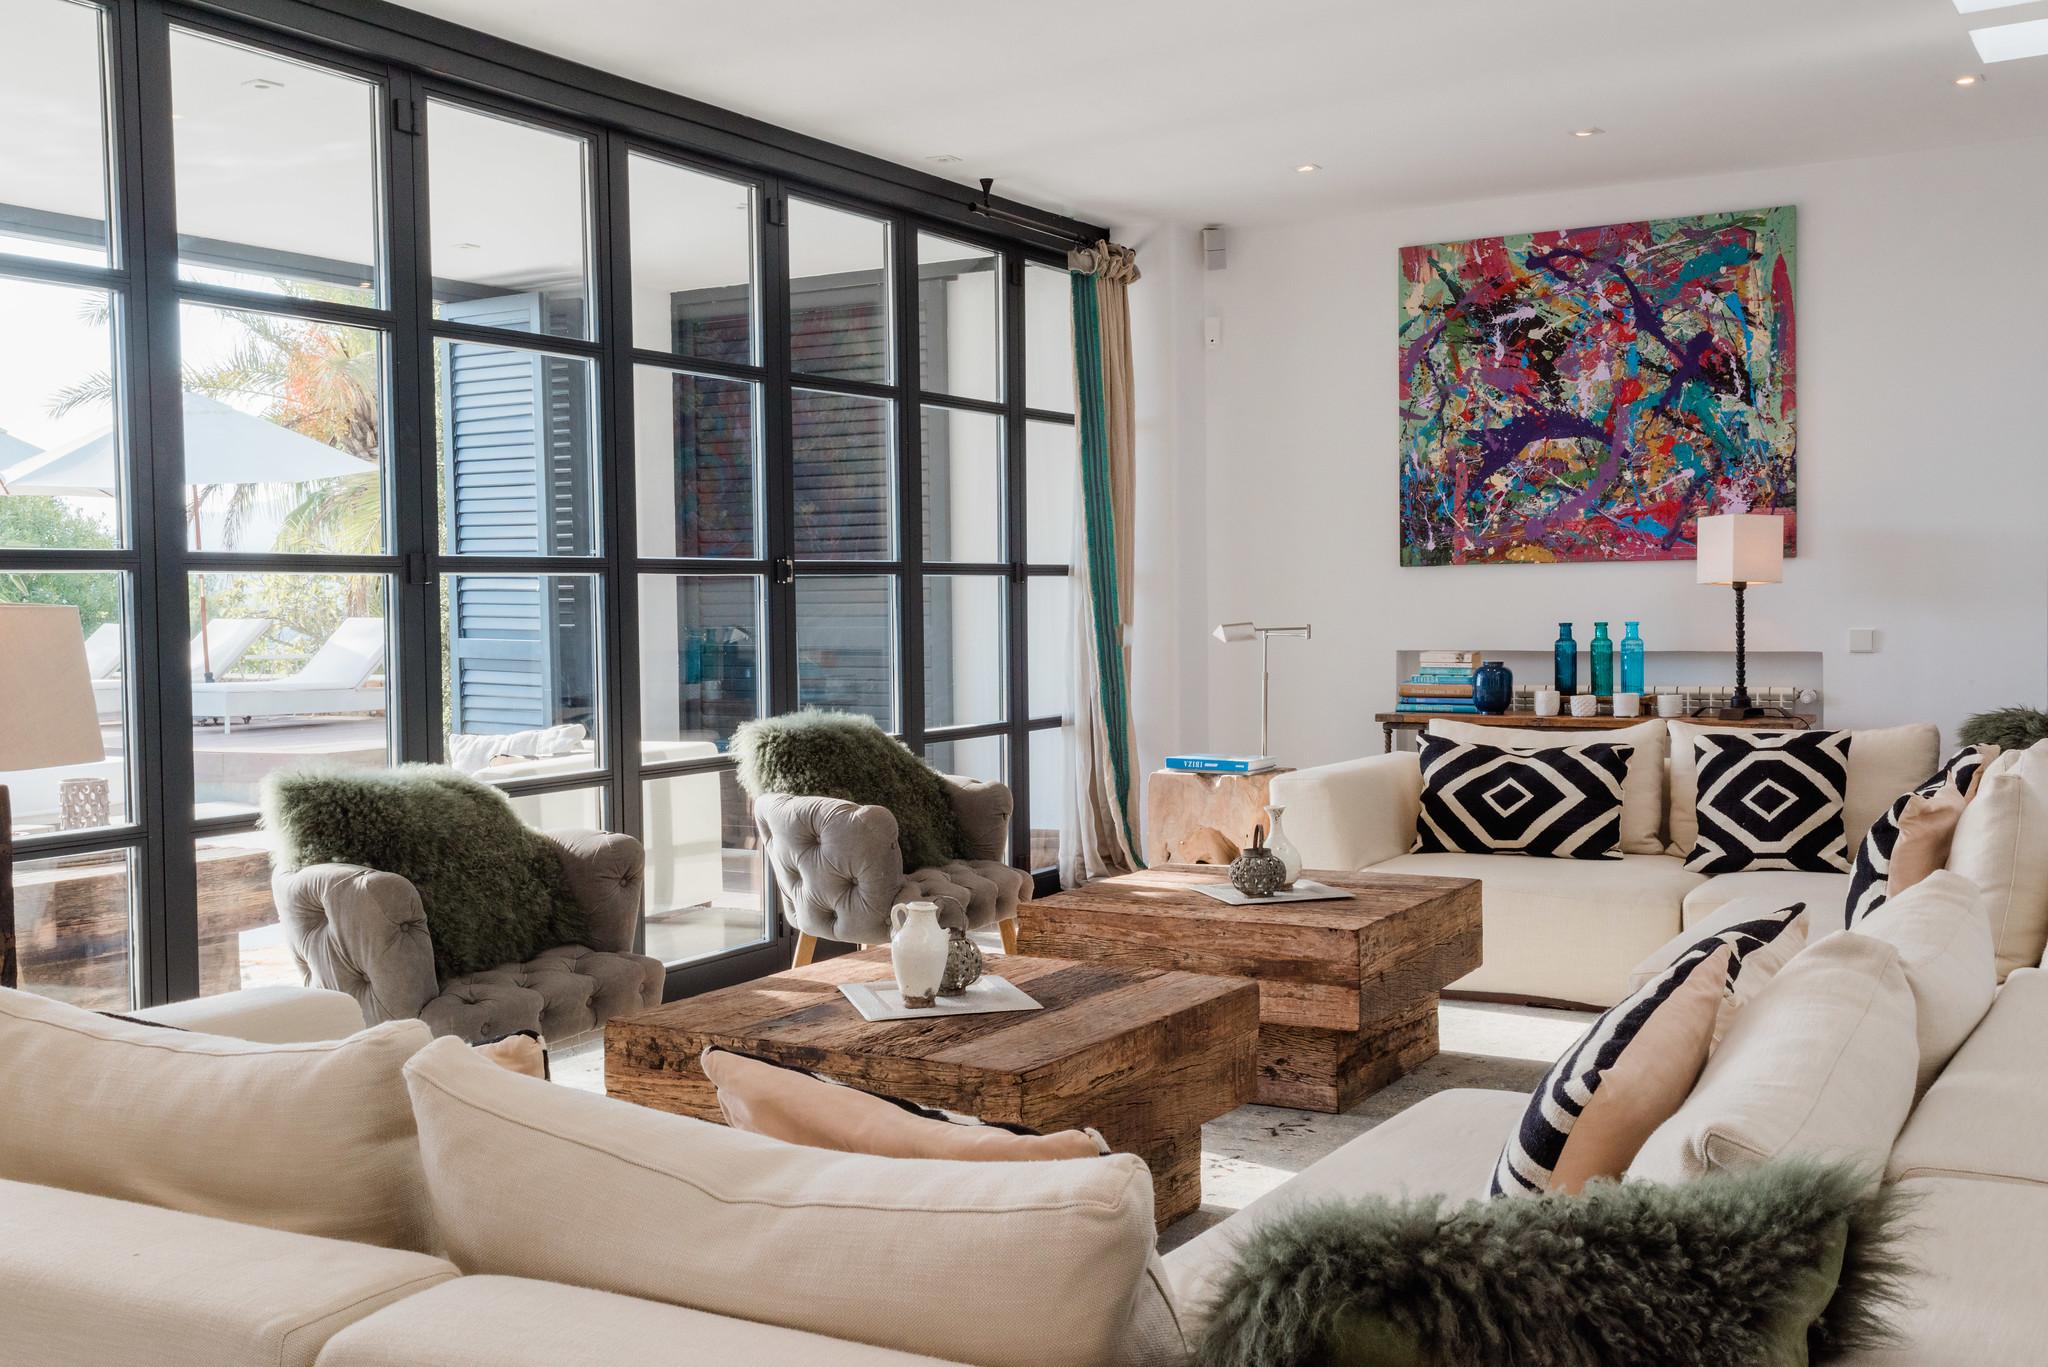 https://www.white-ibiza.com/wp-content/uploads/2020/05/white-ibiza-villas-casa-amalia-interior-living-room.jpg